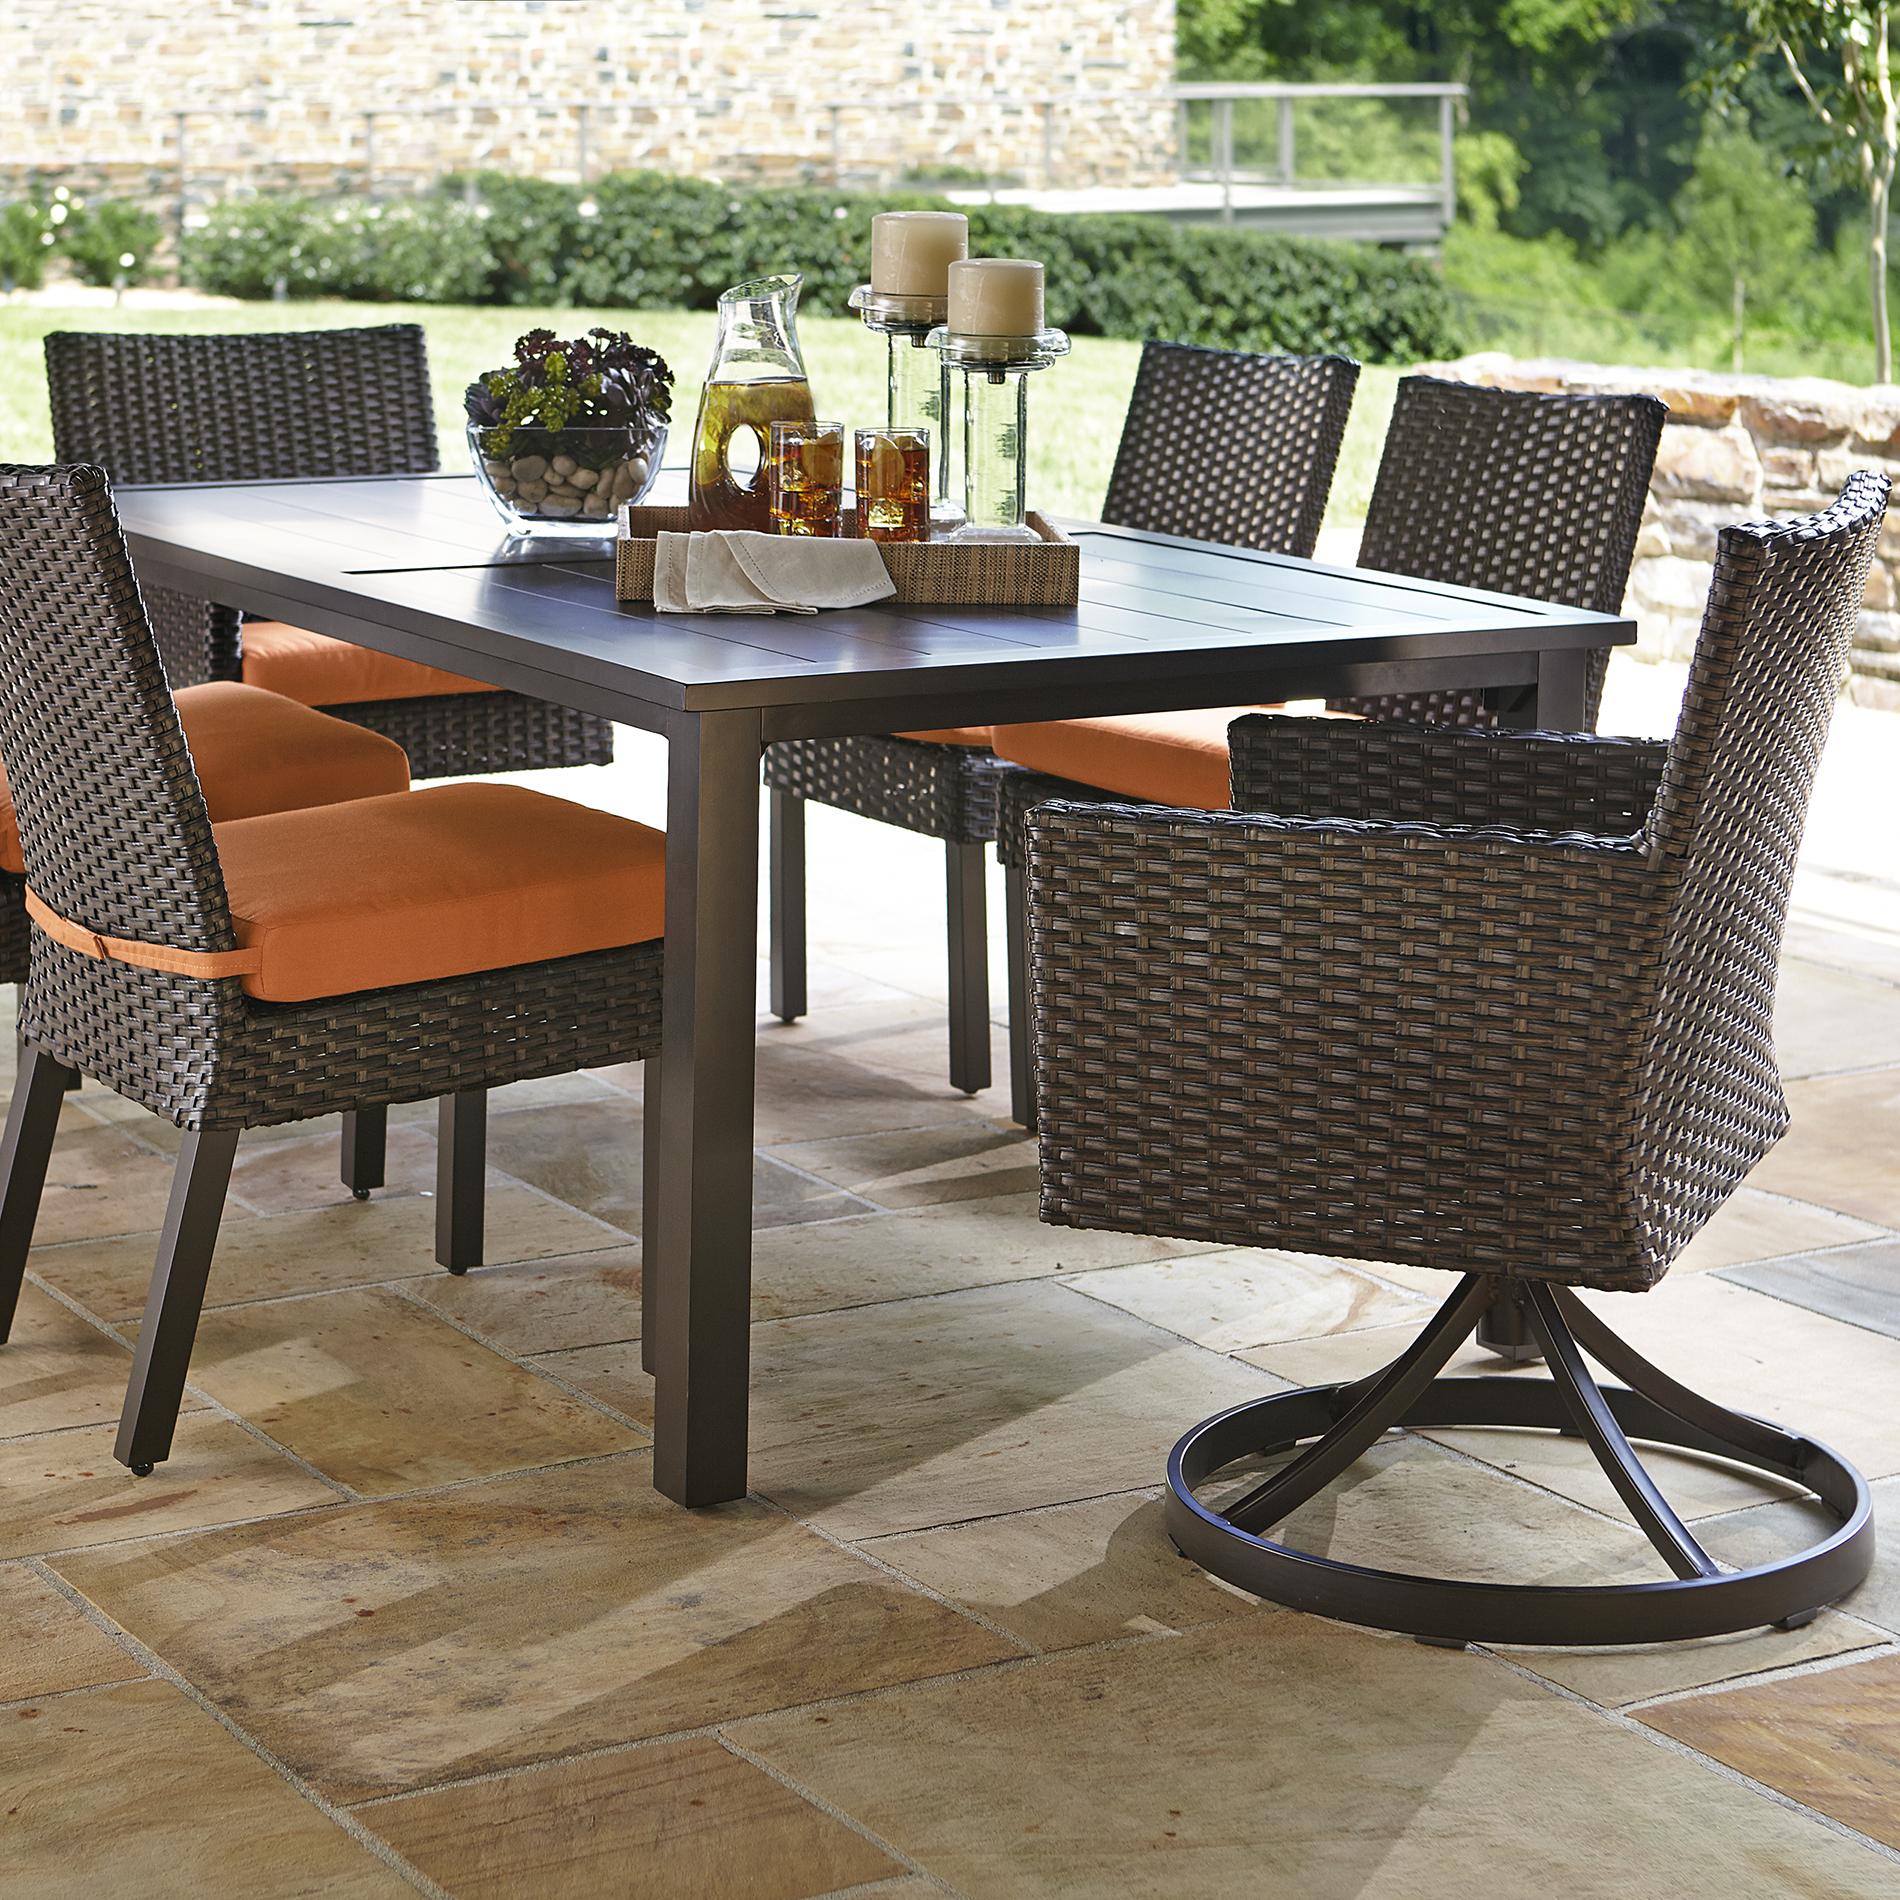 agio international 7 dining rust Agio Patio Furniture id=63075